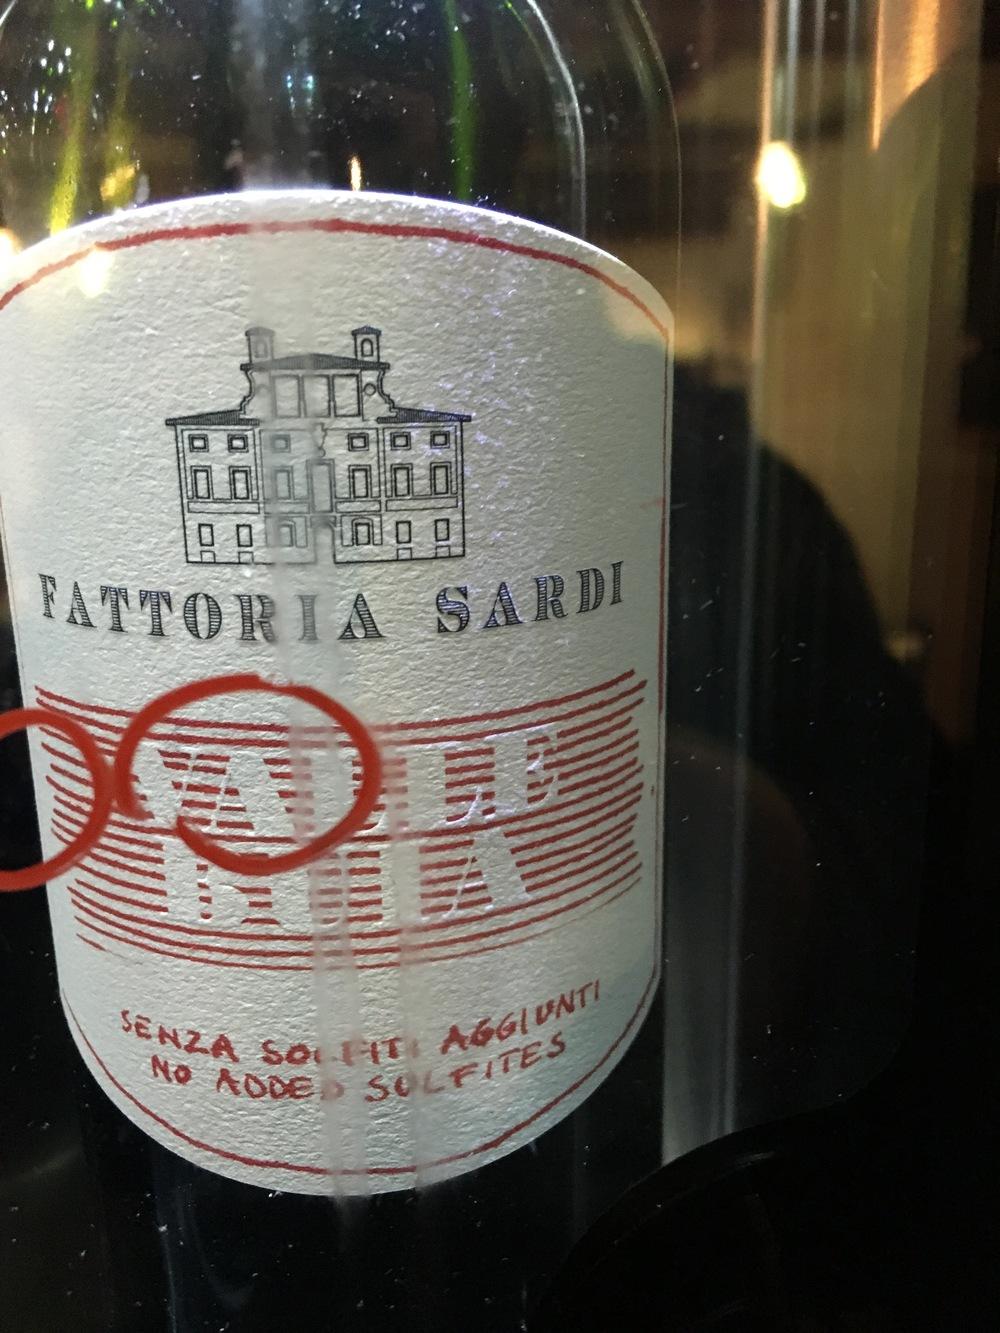 Fattoria Sardi Valle Buia